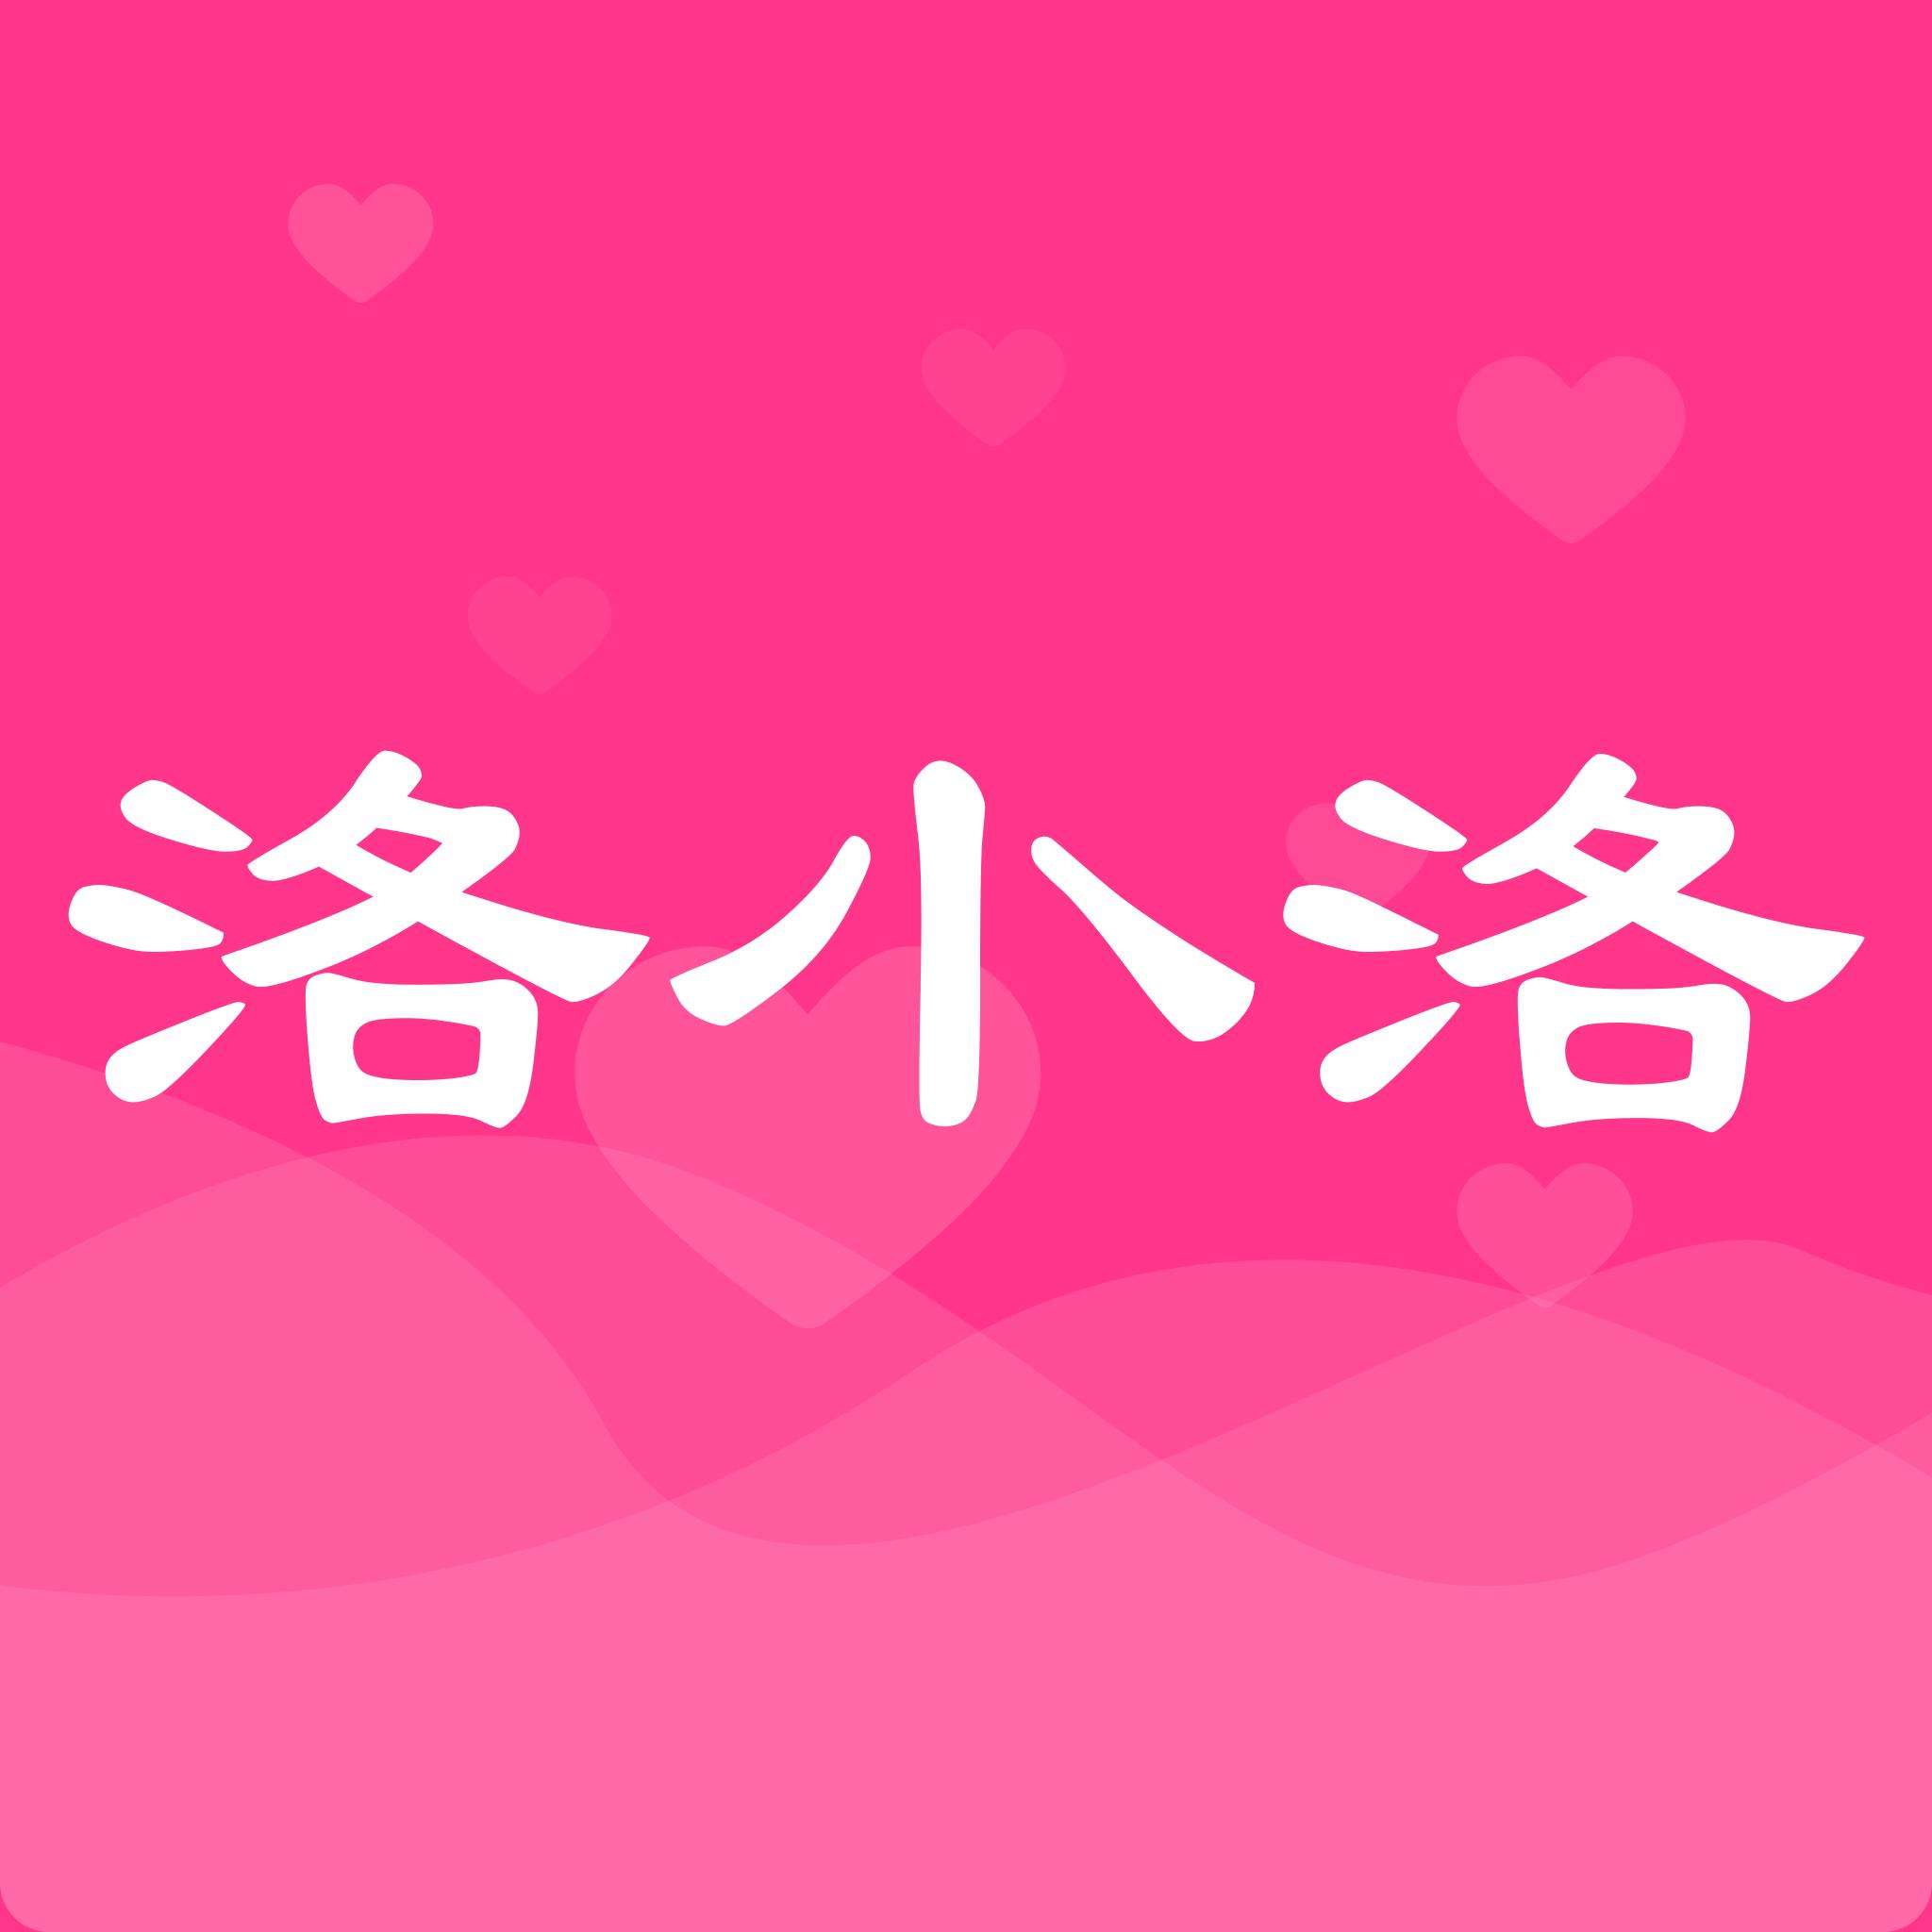 洛小洛appv1.1.3 最新版